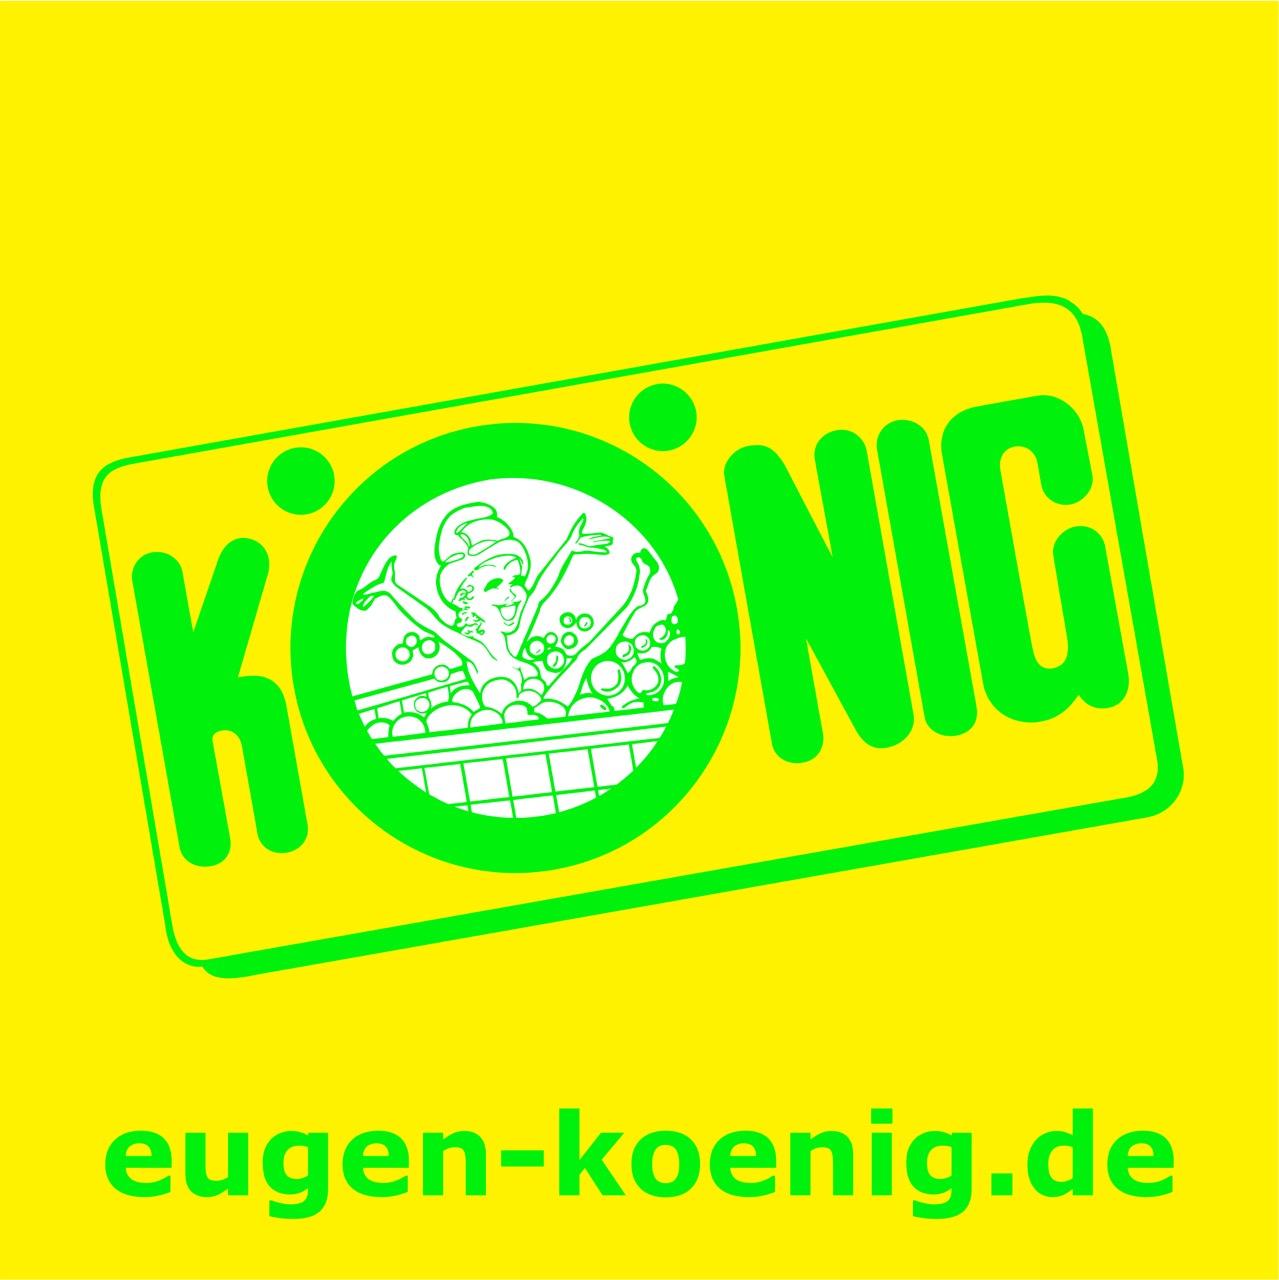 150415-KoeNIG-LOGO-mit URL_300dpi-150x150mm-17772x1772px